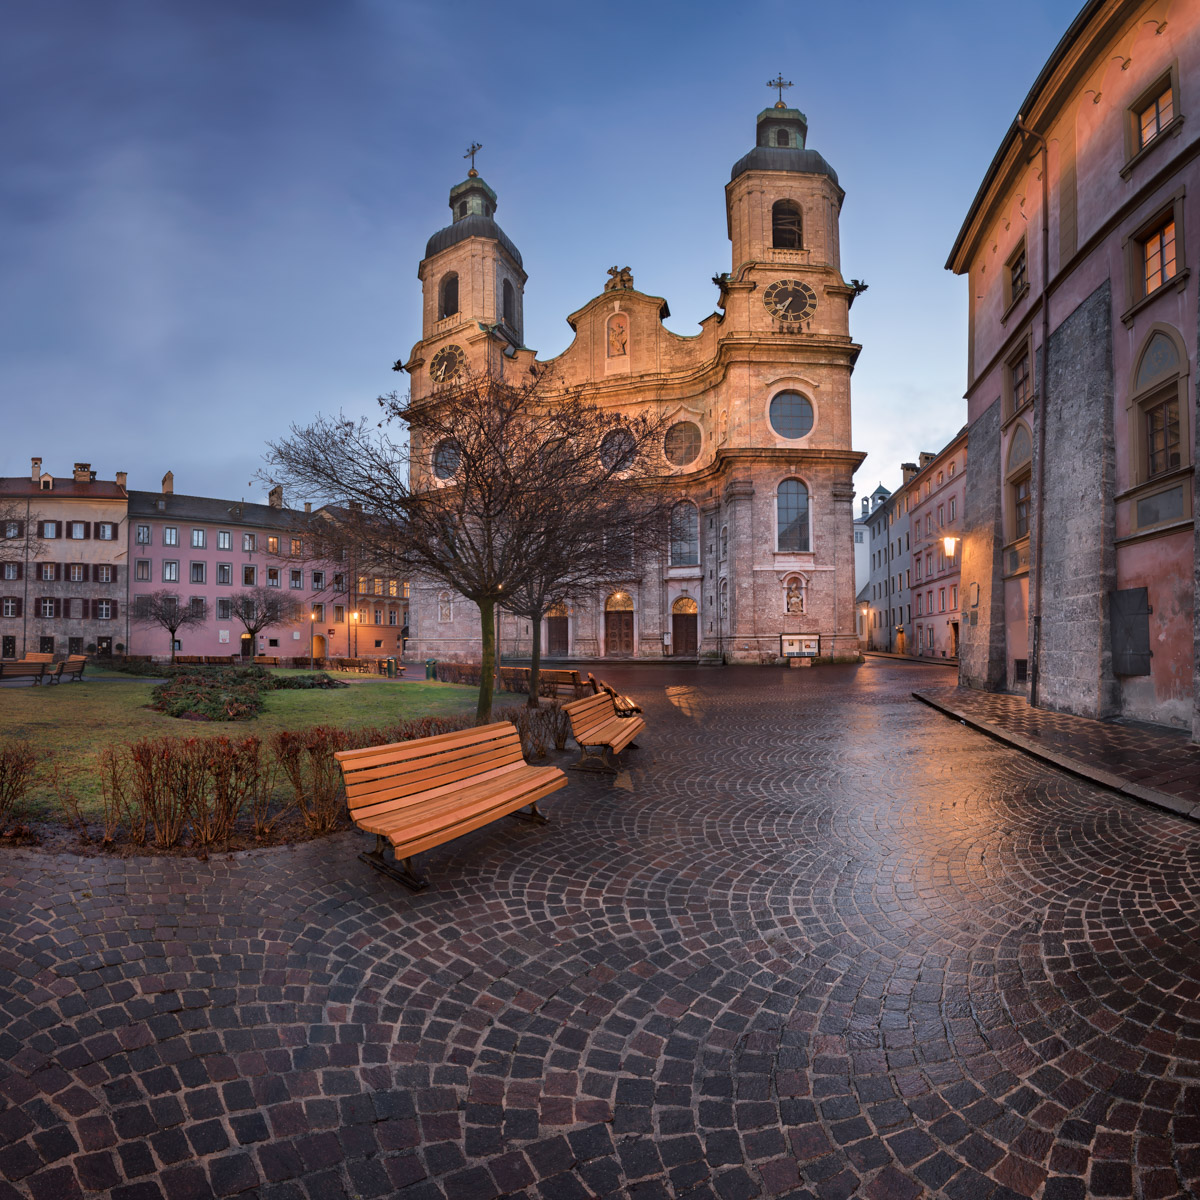 Saint Jacob Cathedral, Innsbruck, Austria